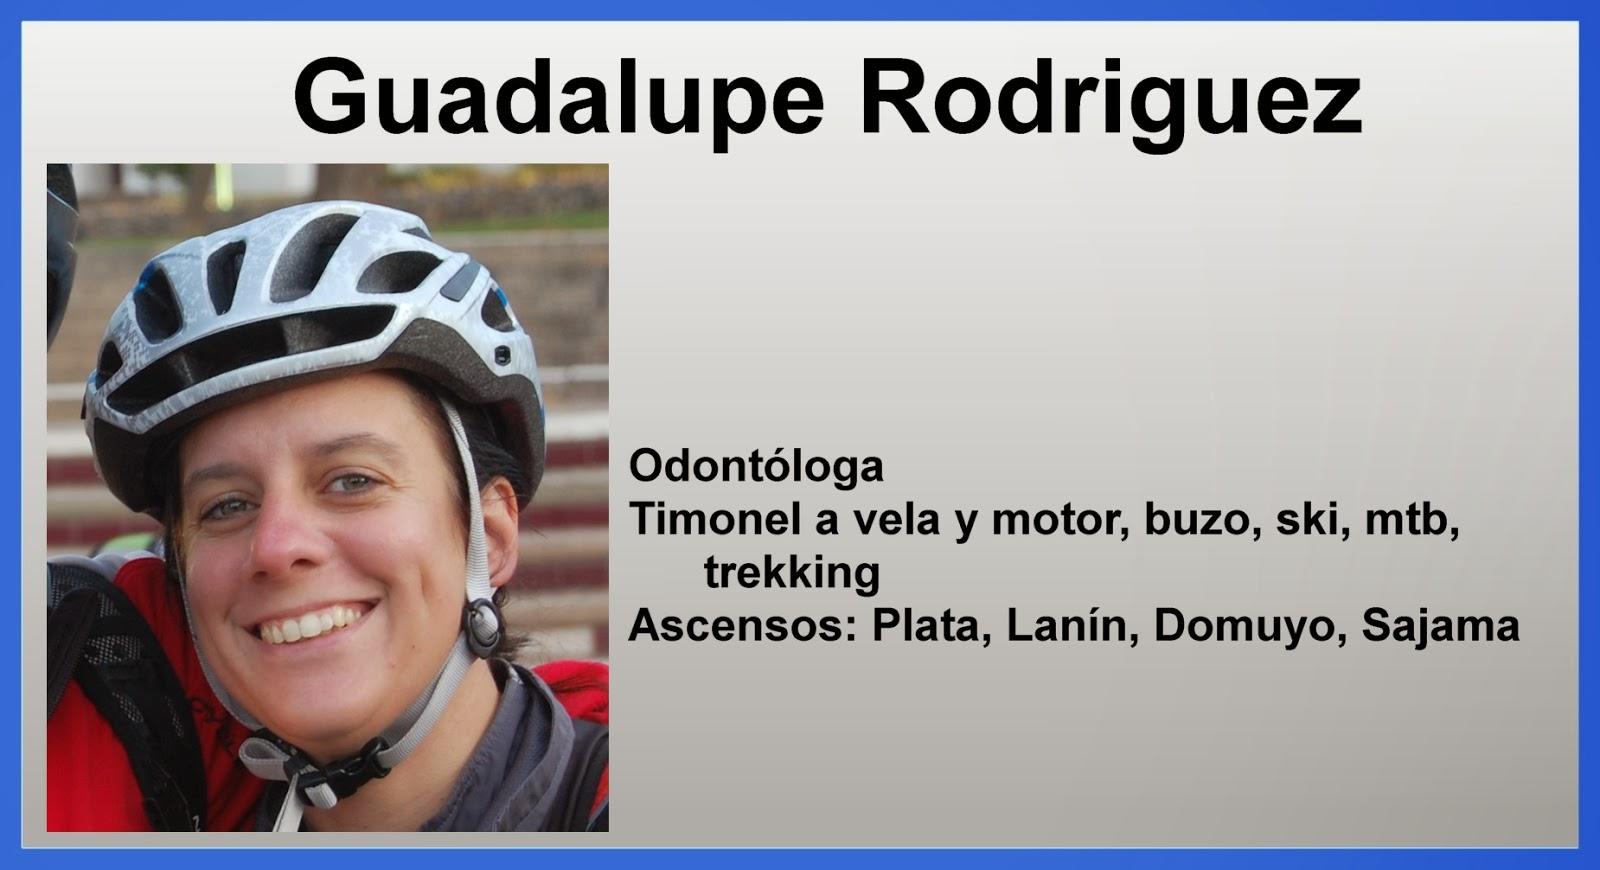 https://www.facebook.com/guadalupe.rodriguez.75491856?ref=ts&fref=ts